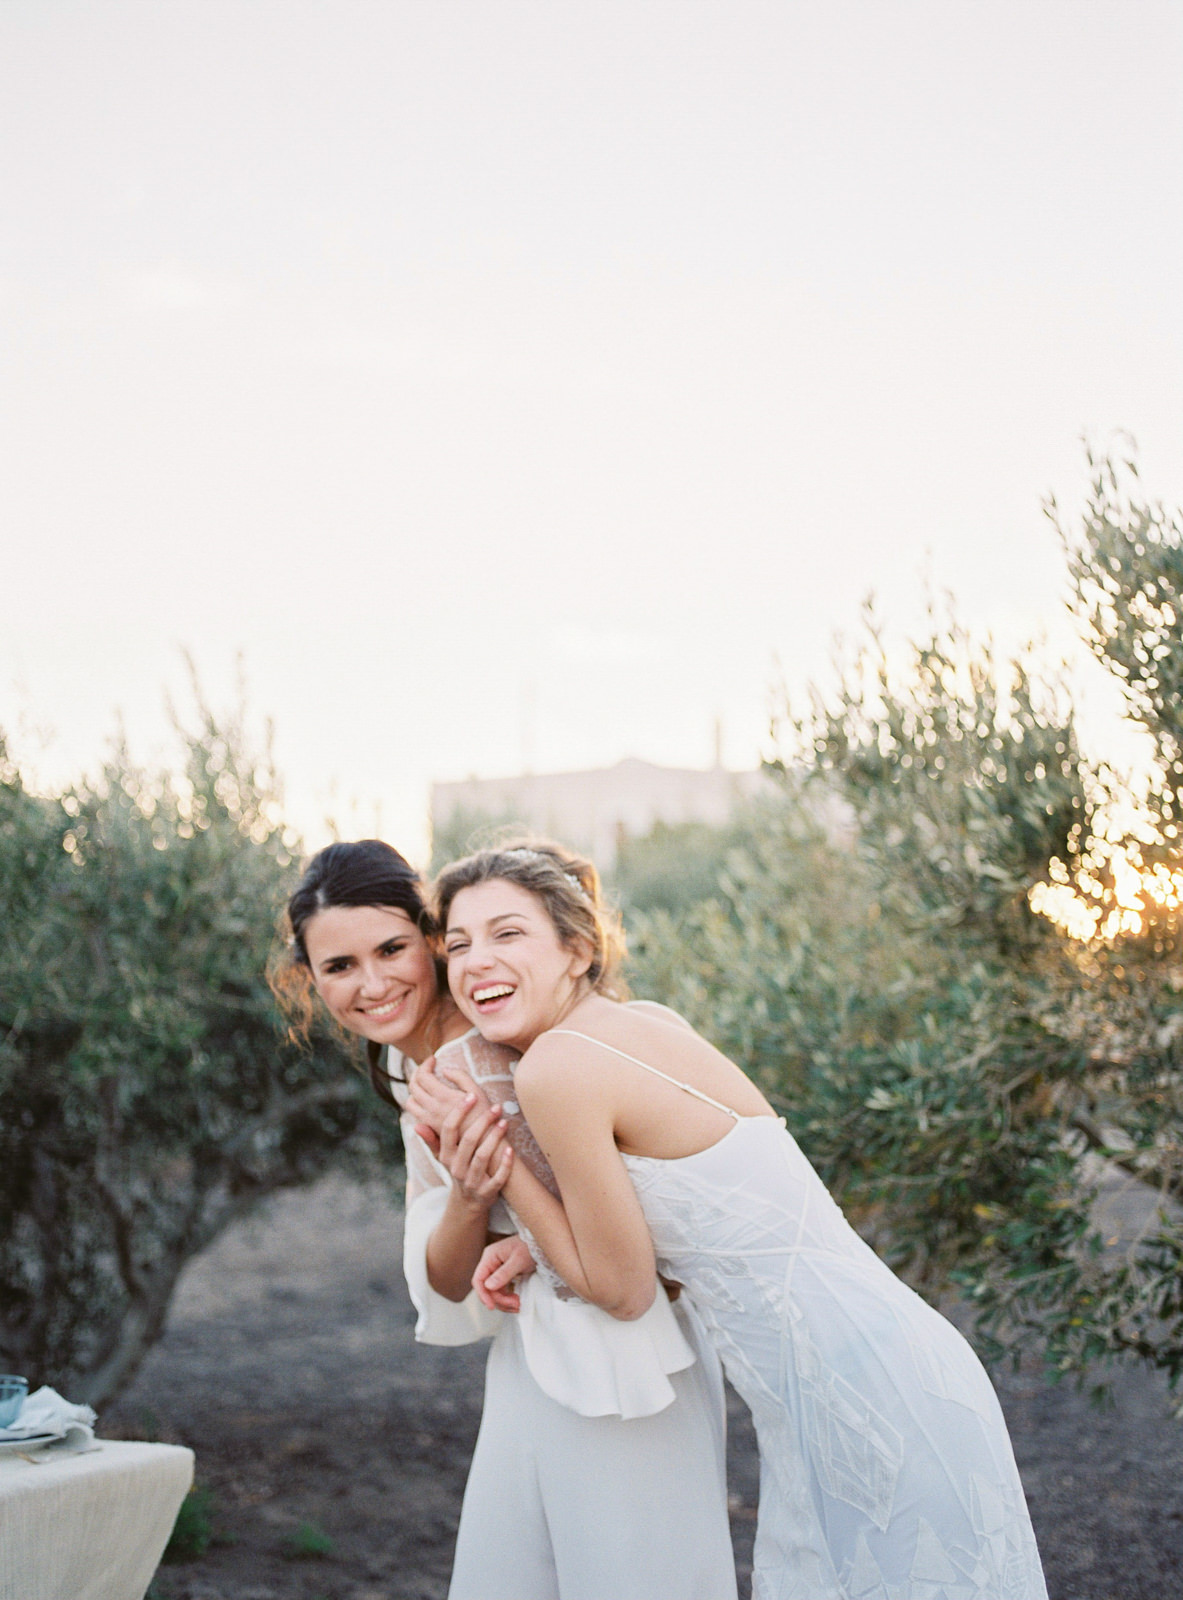 Boho Chic Bohemian Wedding Photographer in Tuscany Italy